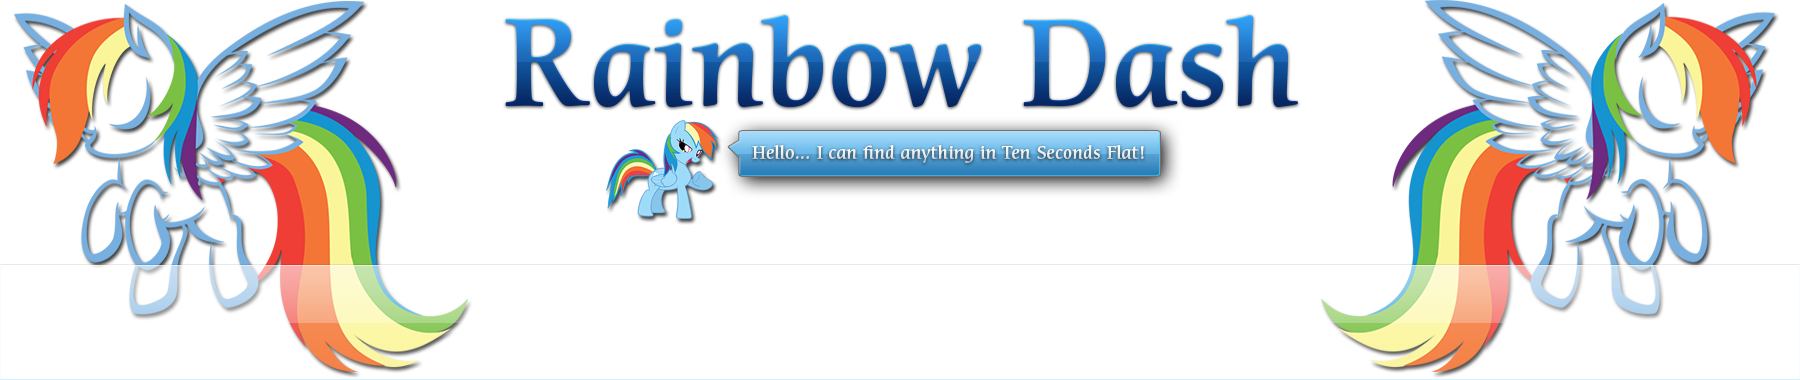 01 - Custom Google Logo (Rainbow Dash on Google)